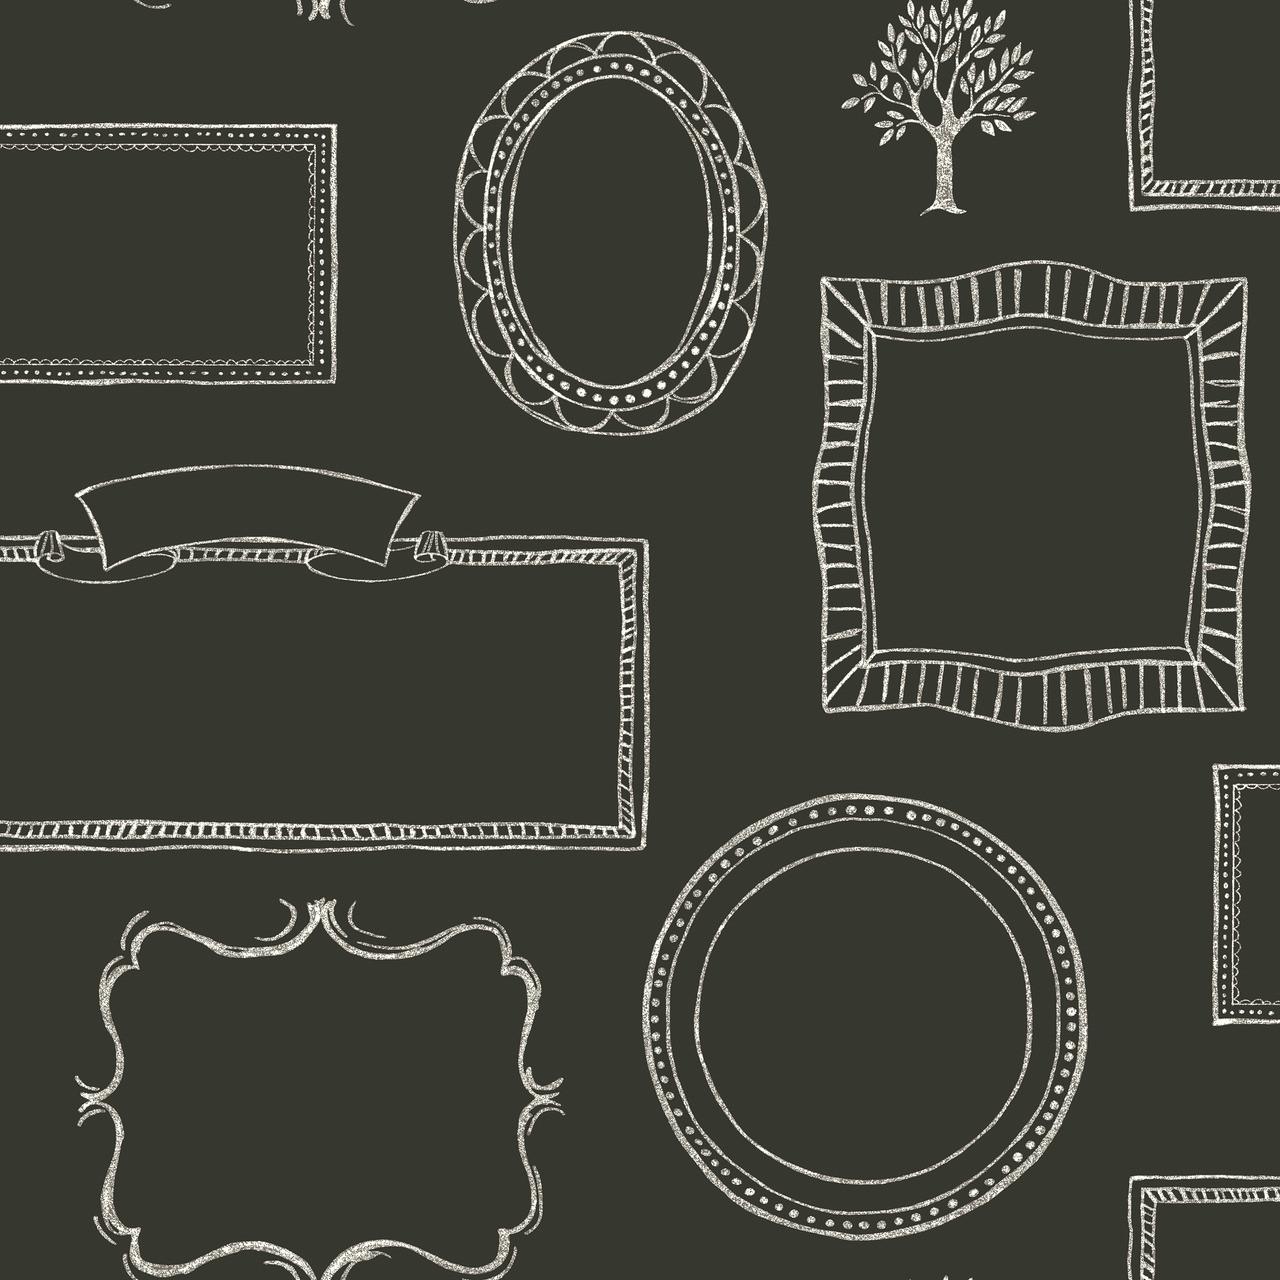 Lg1366 Chalkboard Frames Wallpaper Black Indoorwallpaper Com